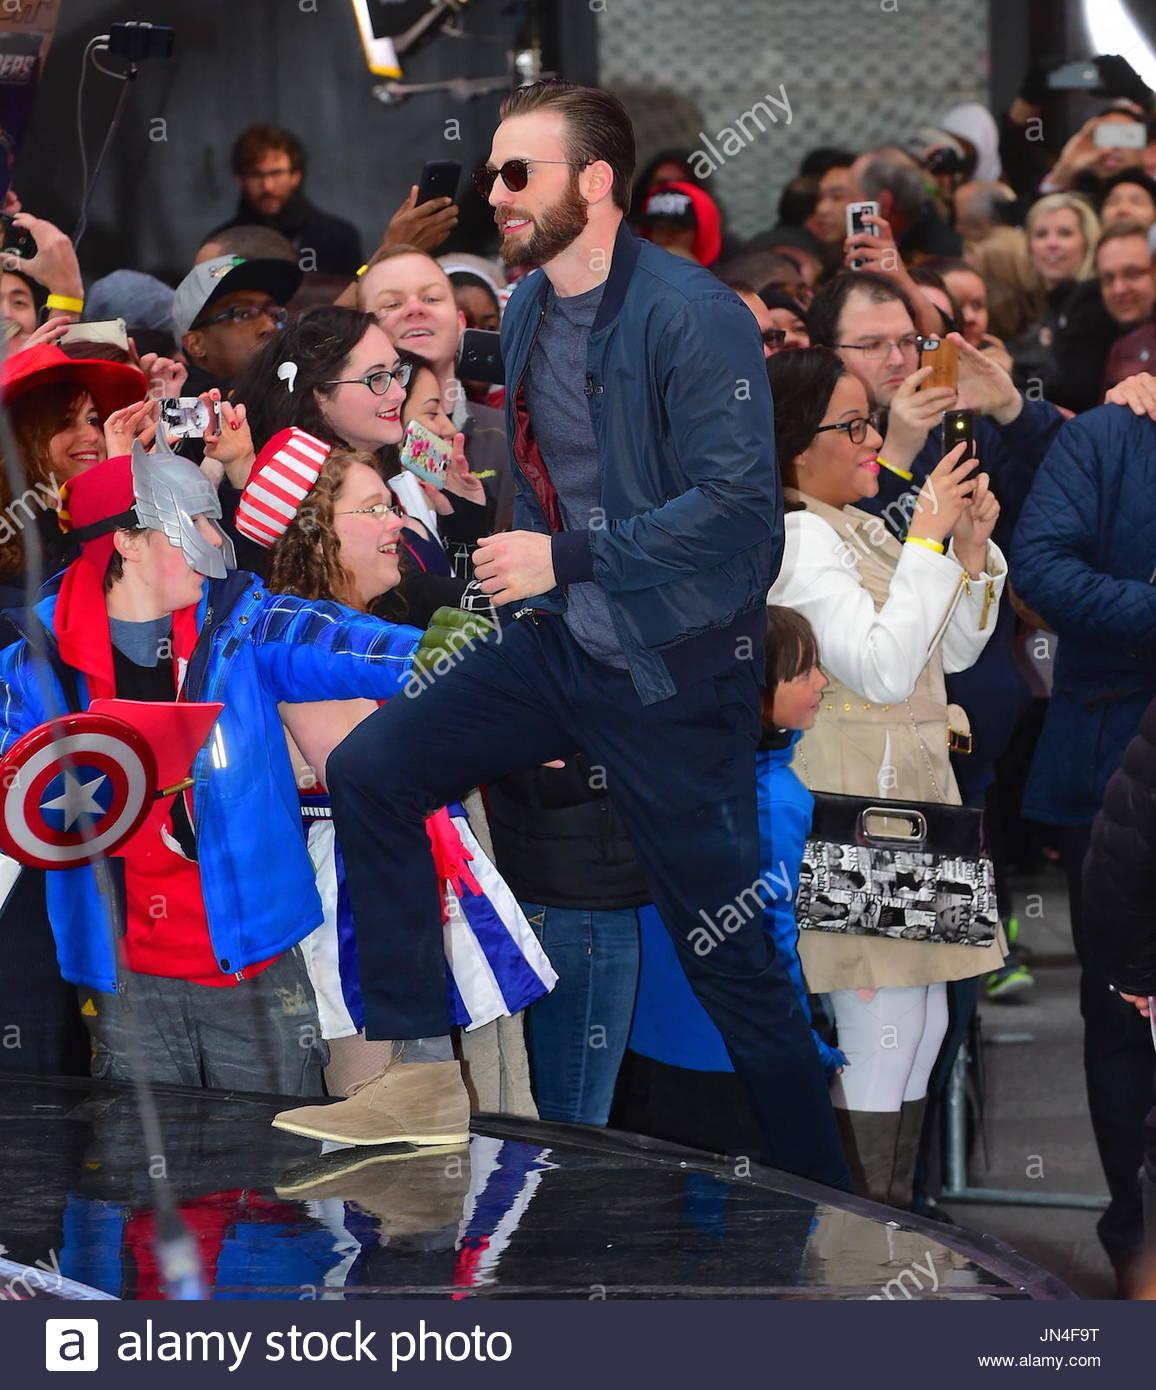 Chris Evans The Men From Avengers Minus Hemsworth Were Seen